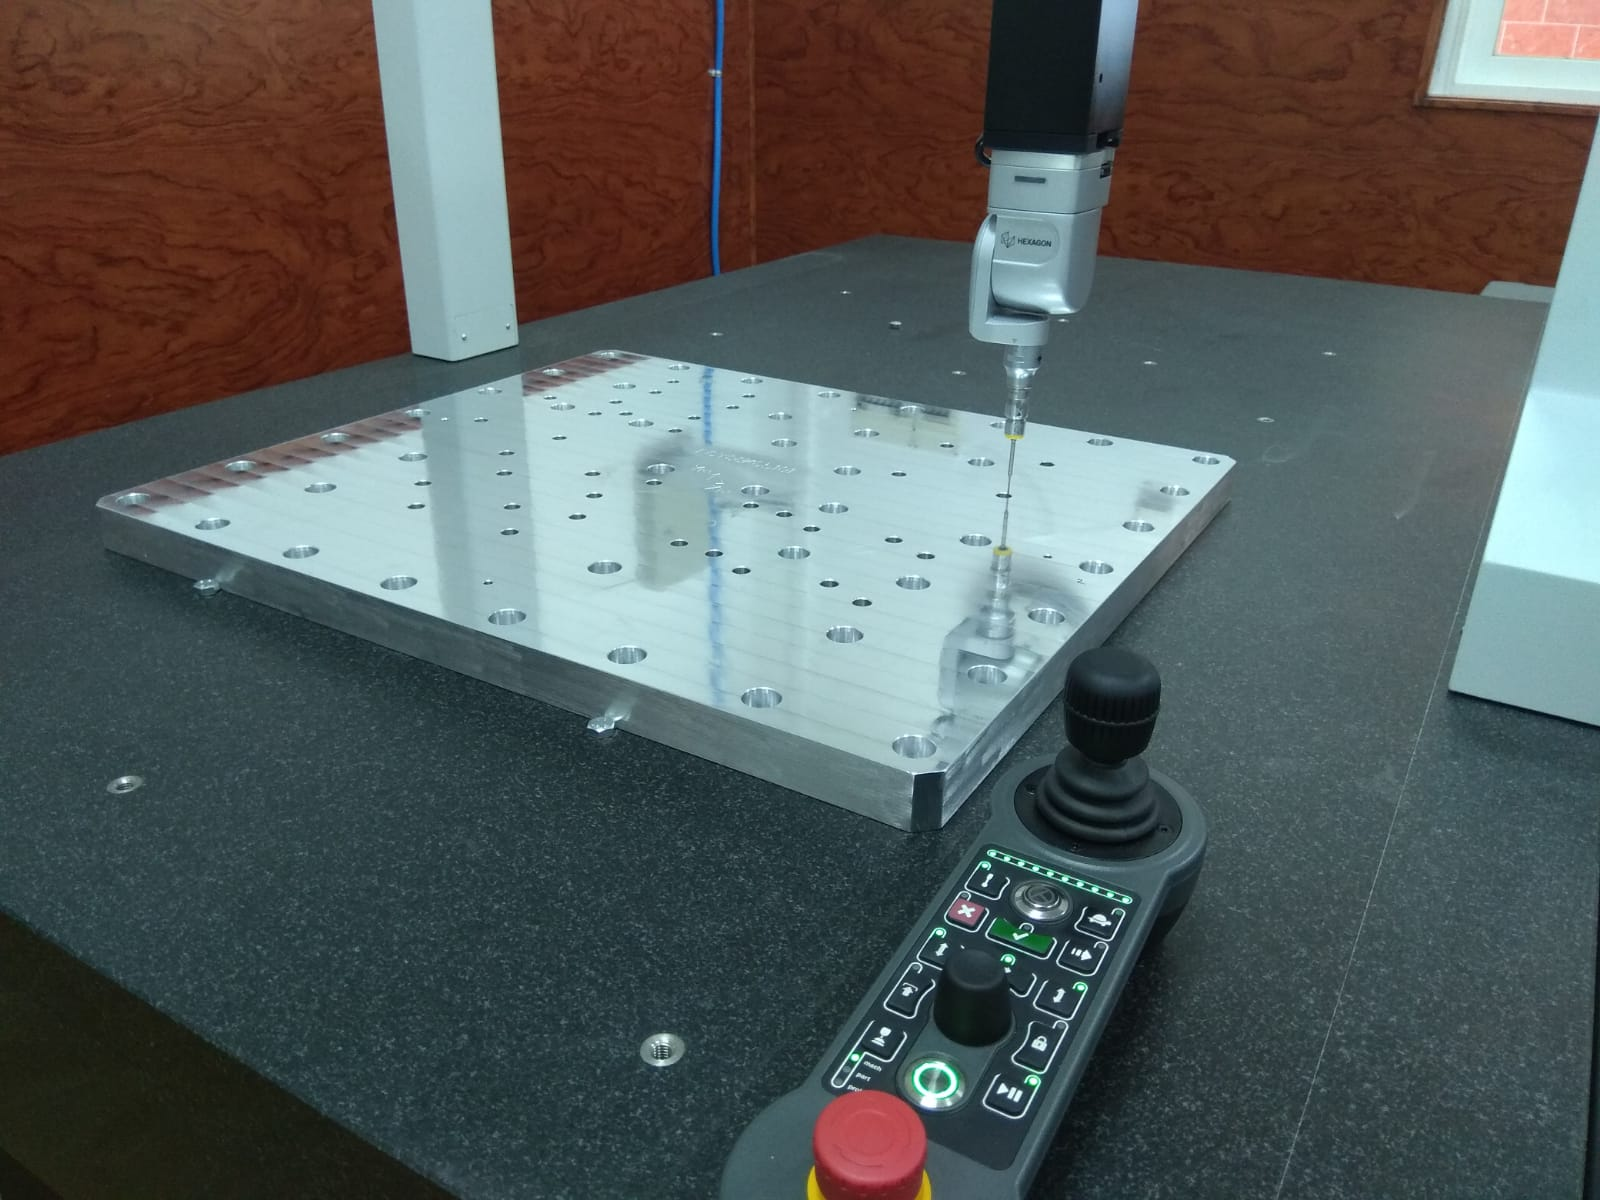 IMG 20181001 WA0023 1 - Mecanizado de Piezas